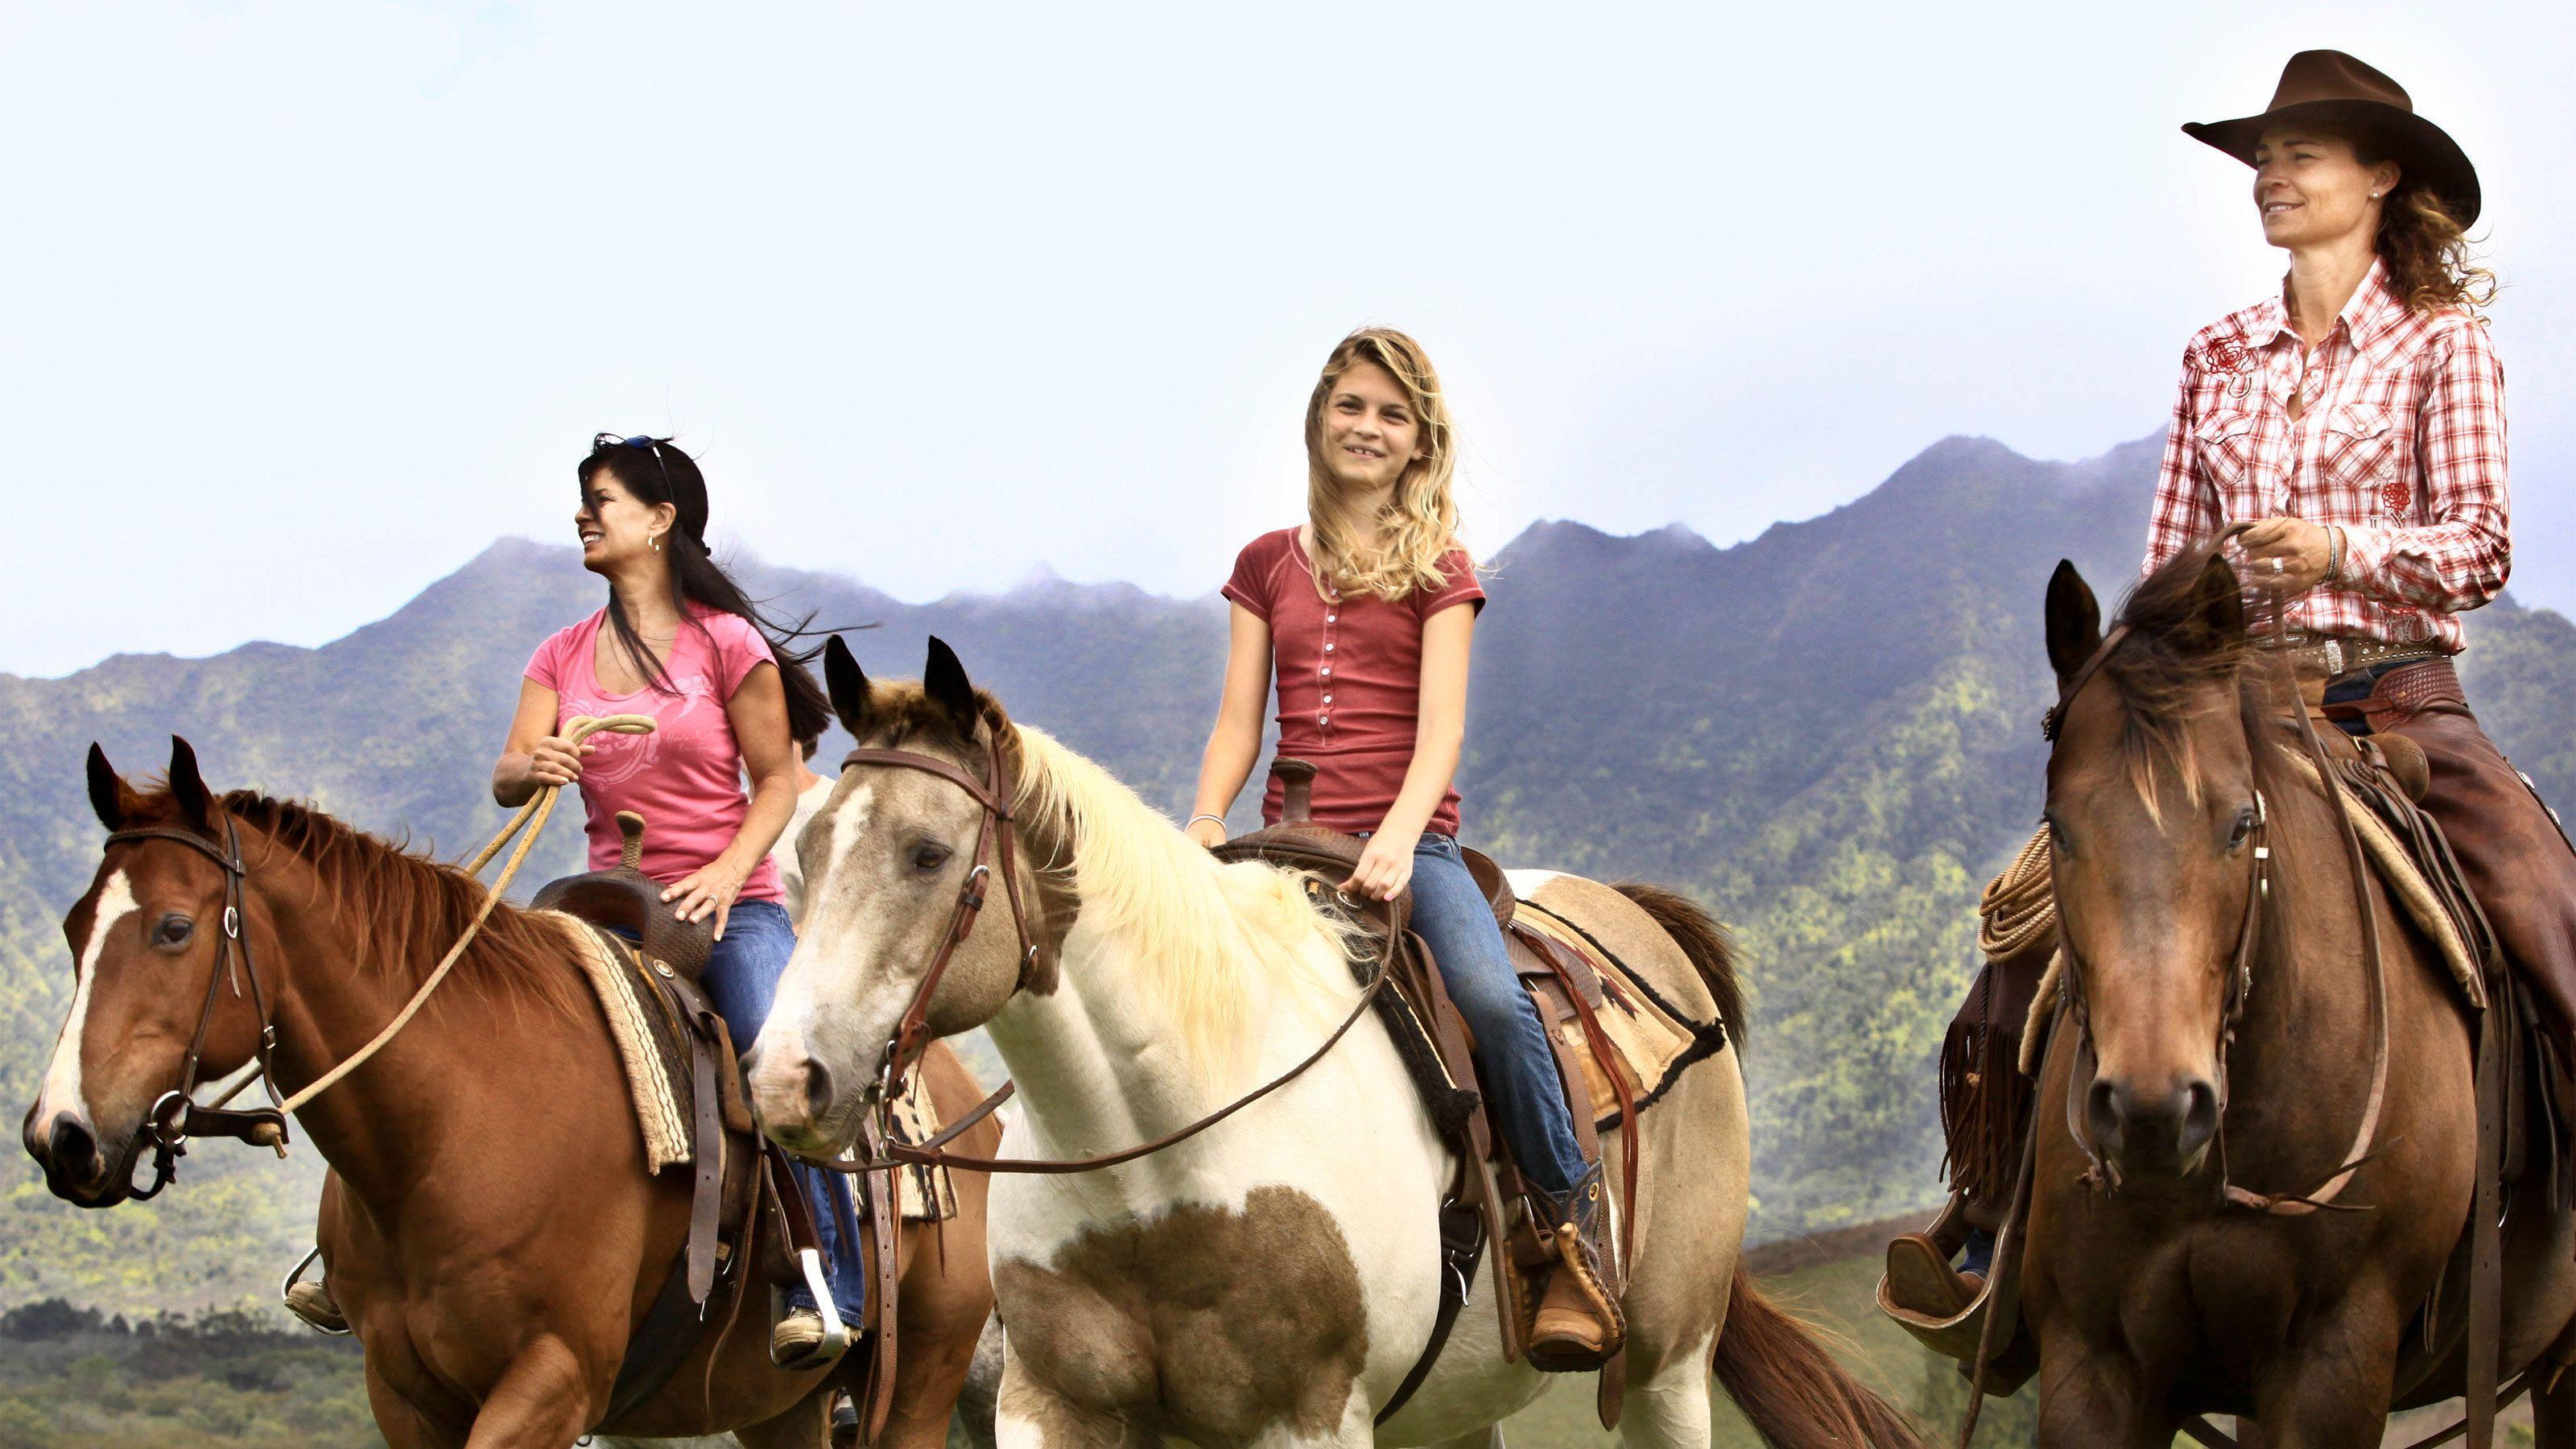 three women riding horseback in Kauai